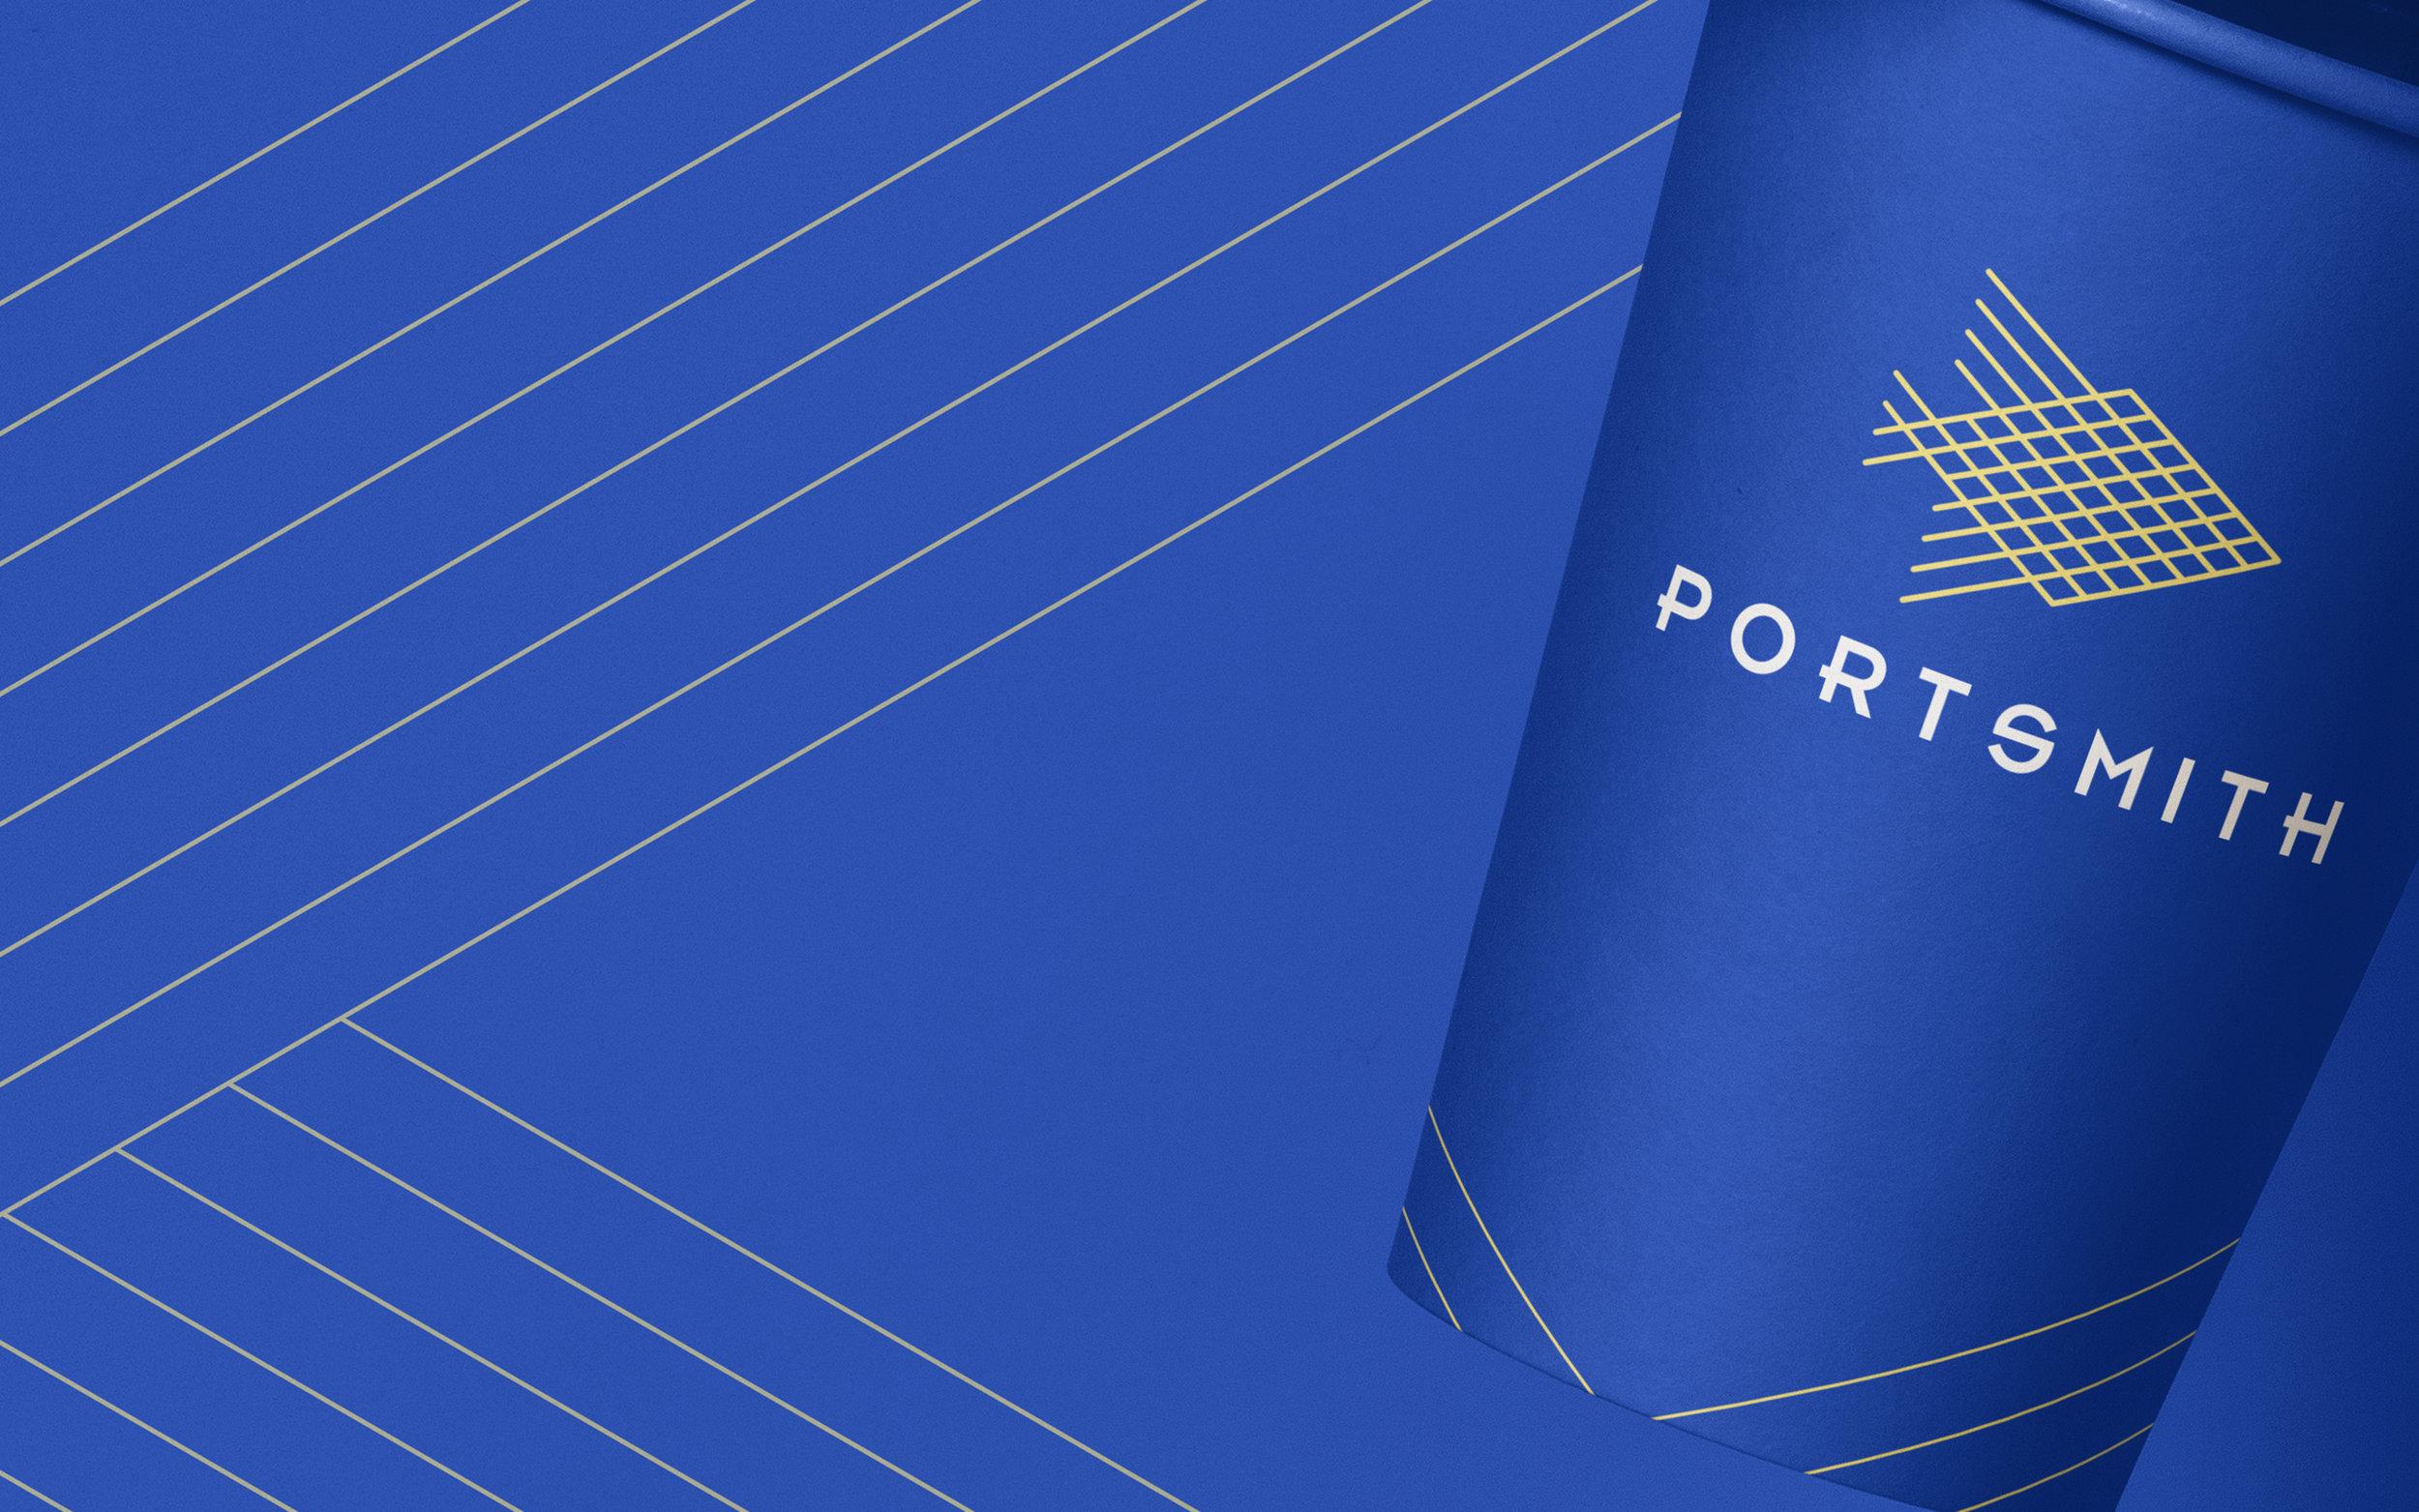 sorto-portsmith-coffee.jpg